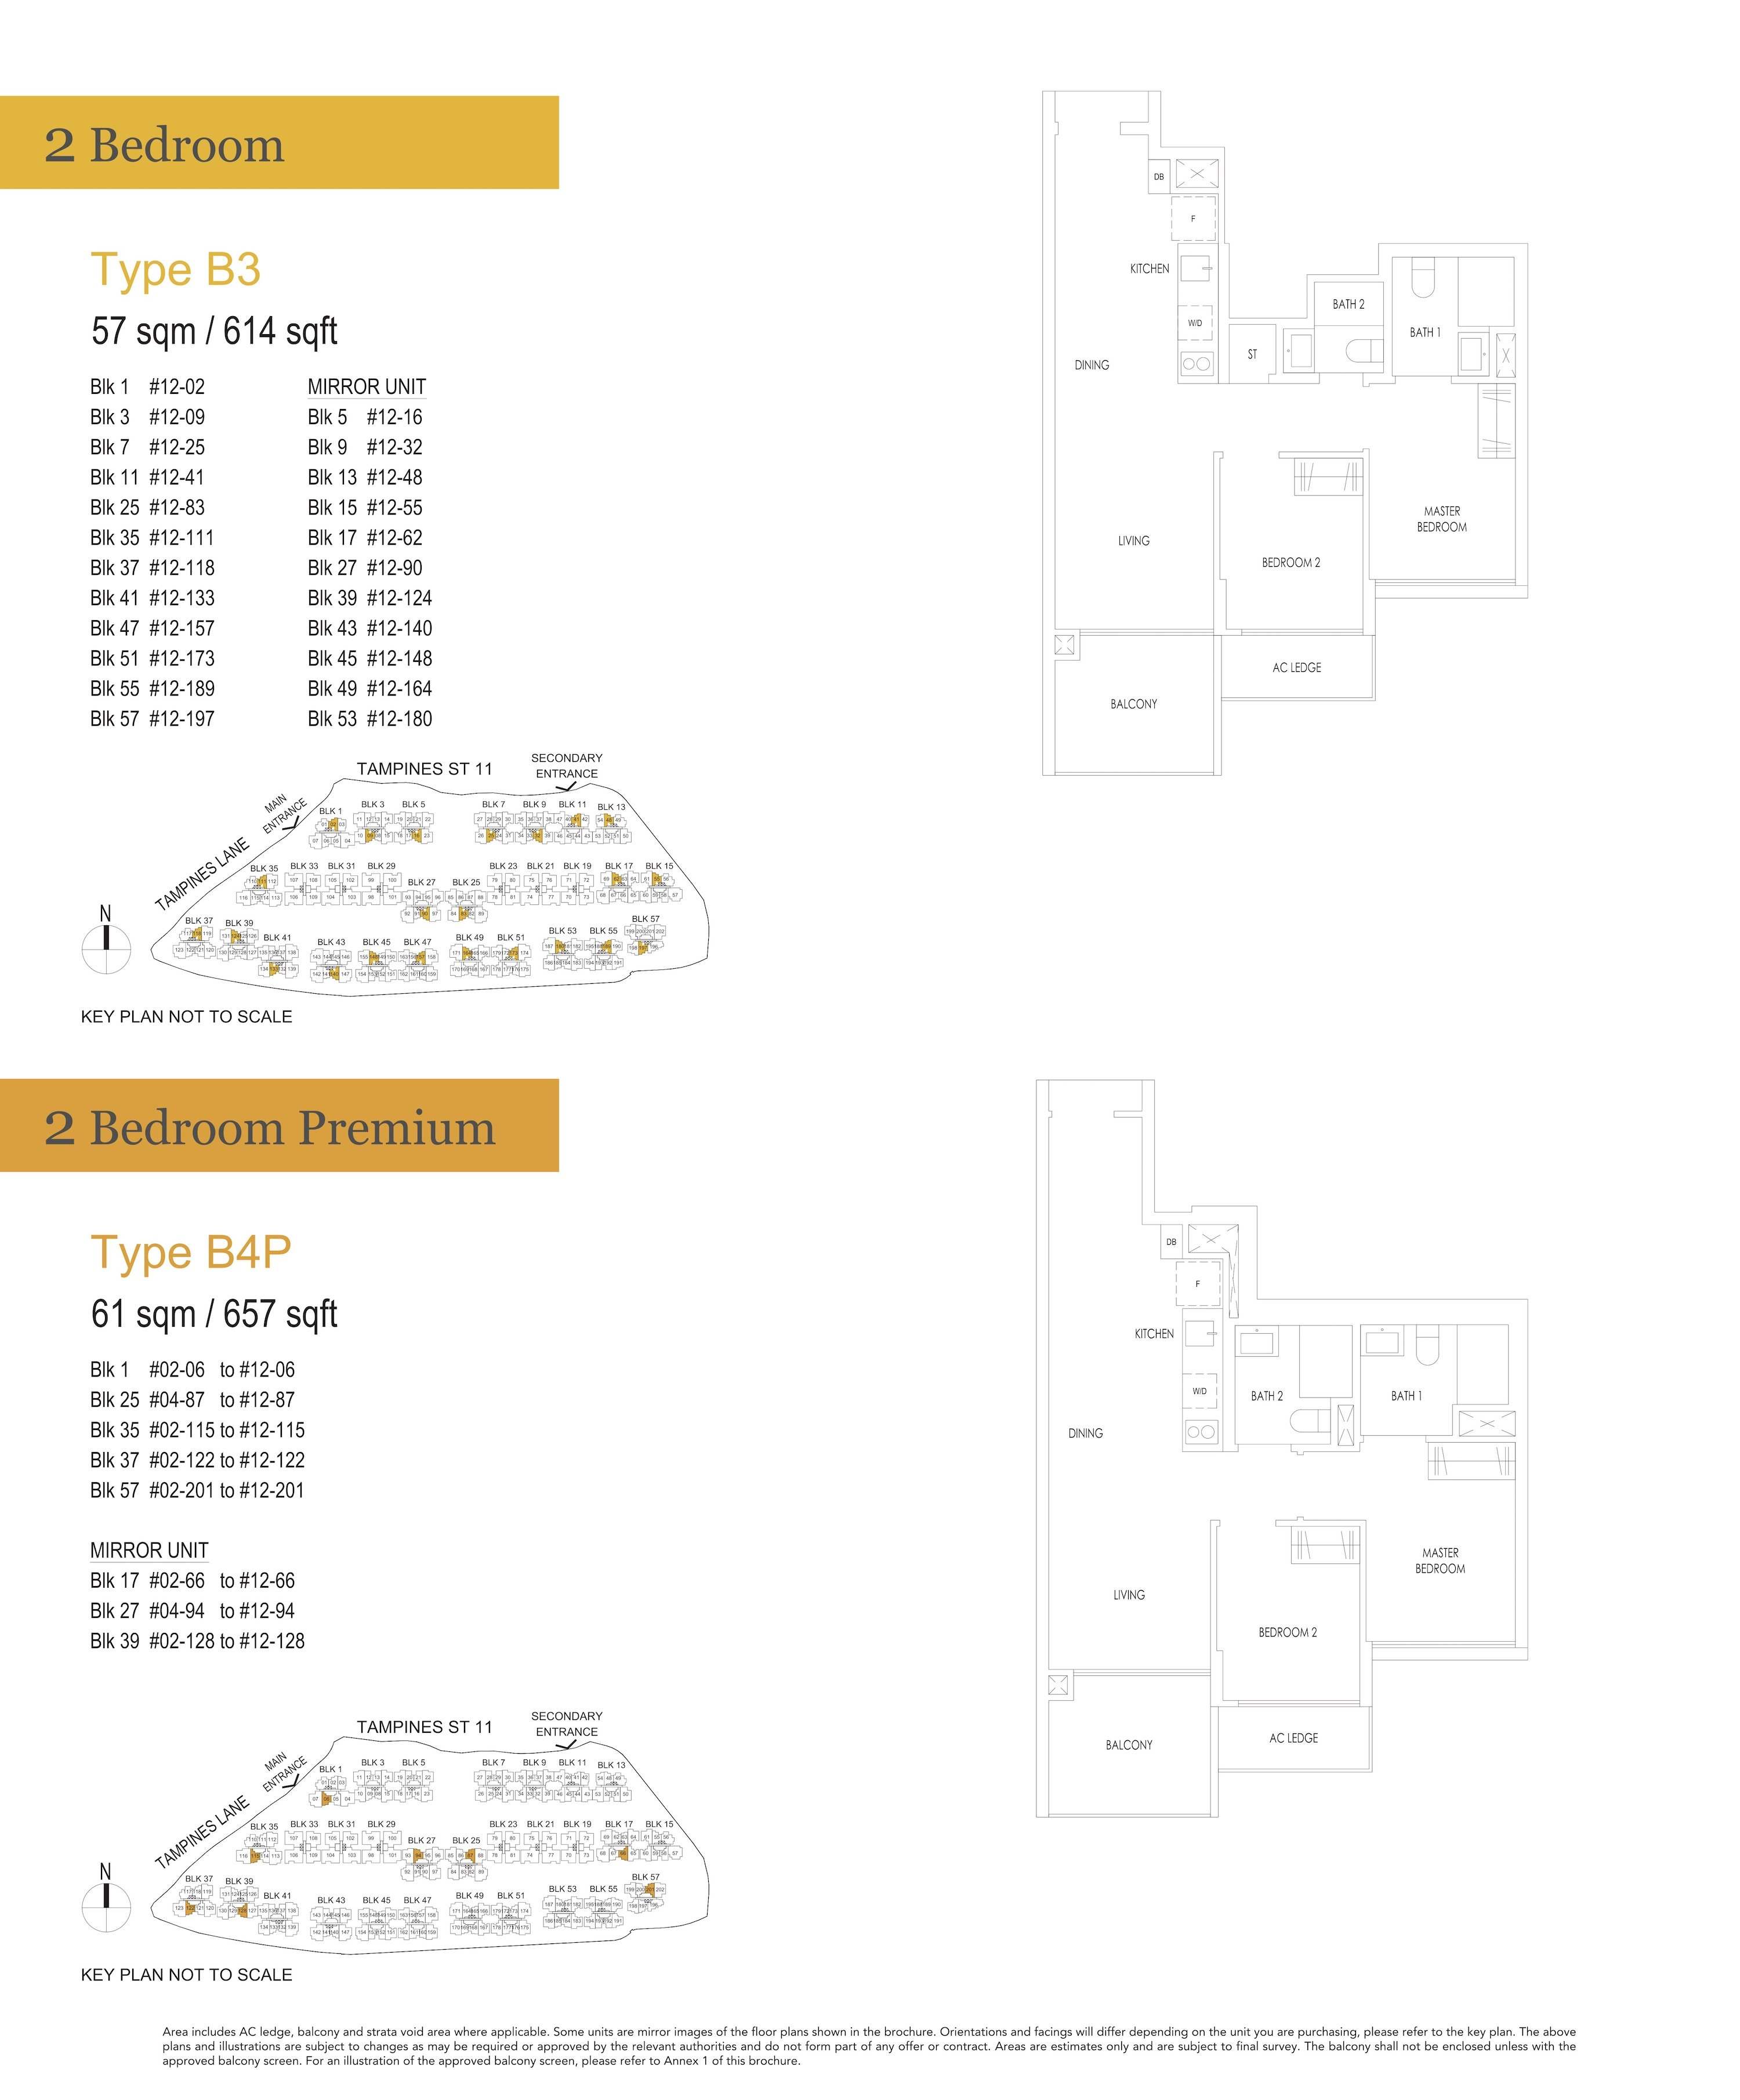 Treasure At Tampines 聚宝园 2-bedroom 2卧房 B3 B4P